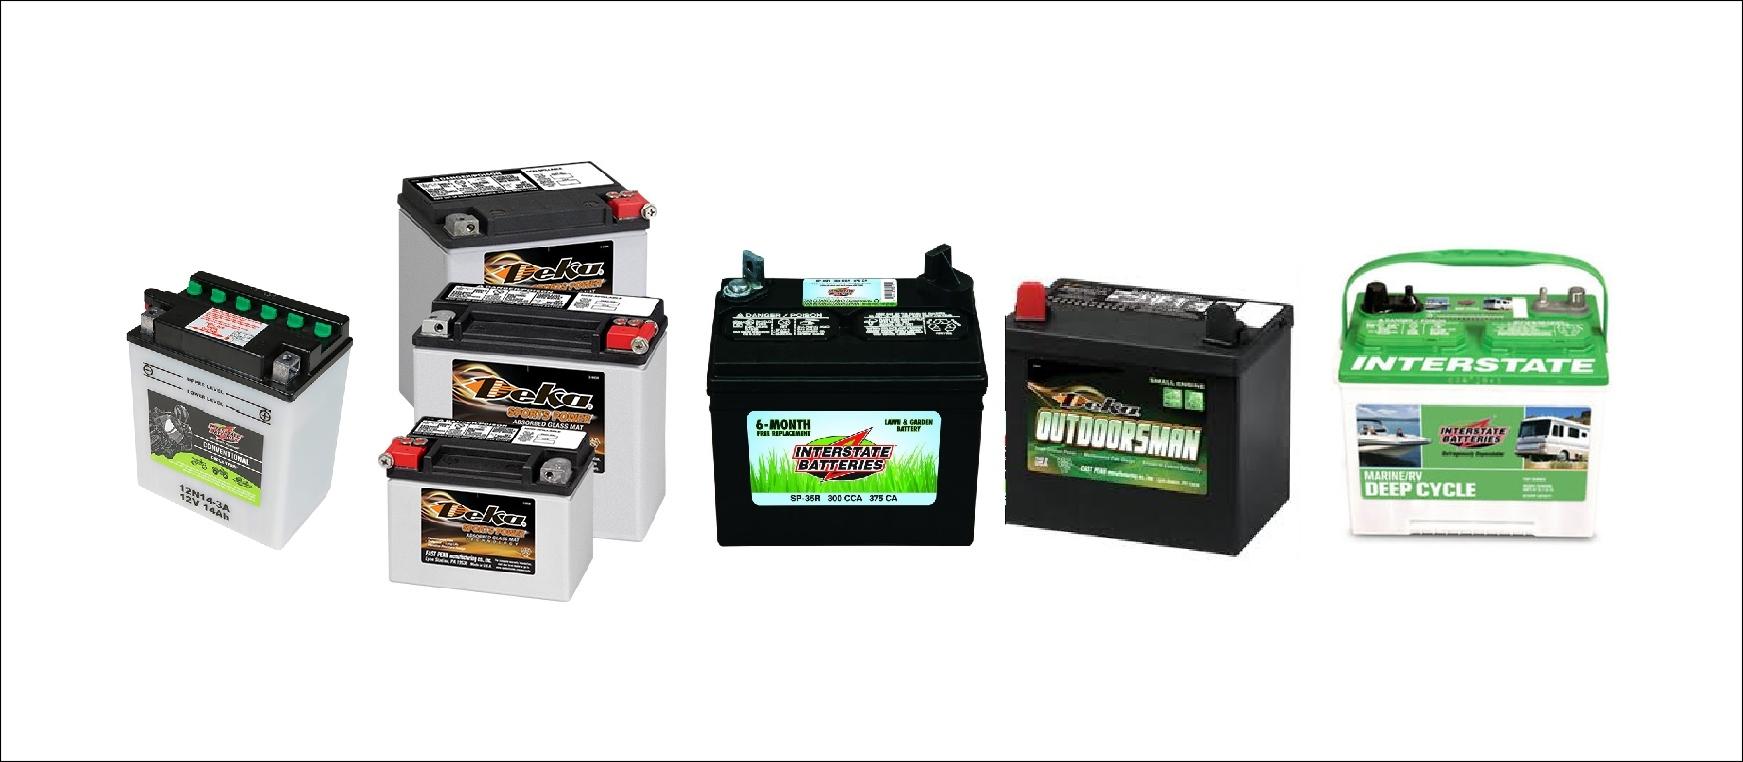 We Stock Many Different DEKA & INTERSTATE Motorcycle, ATV, Marine & Garden Tractor Batteries